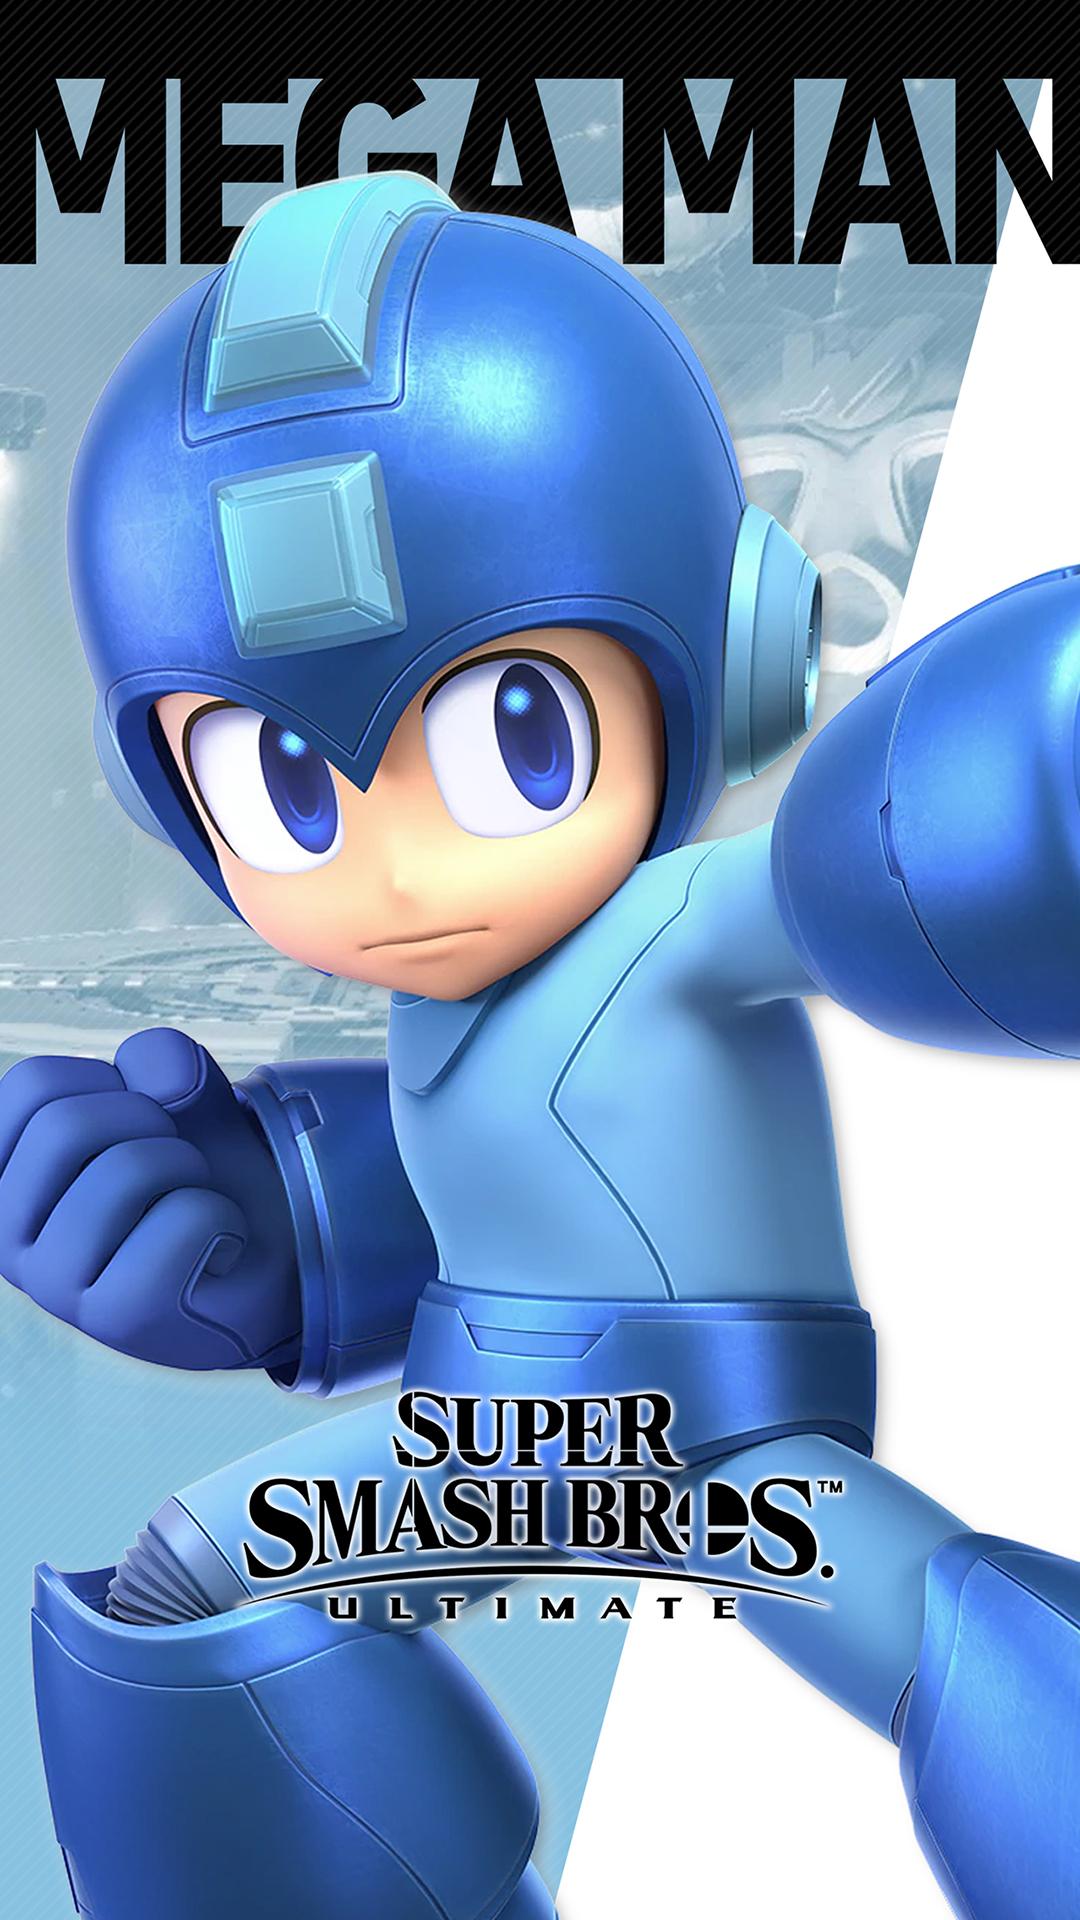 Cat Wallpaper Iphone X Super Smash Bros Ultimate Mega Man Wallpapers Cat With